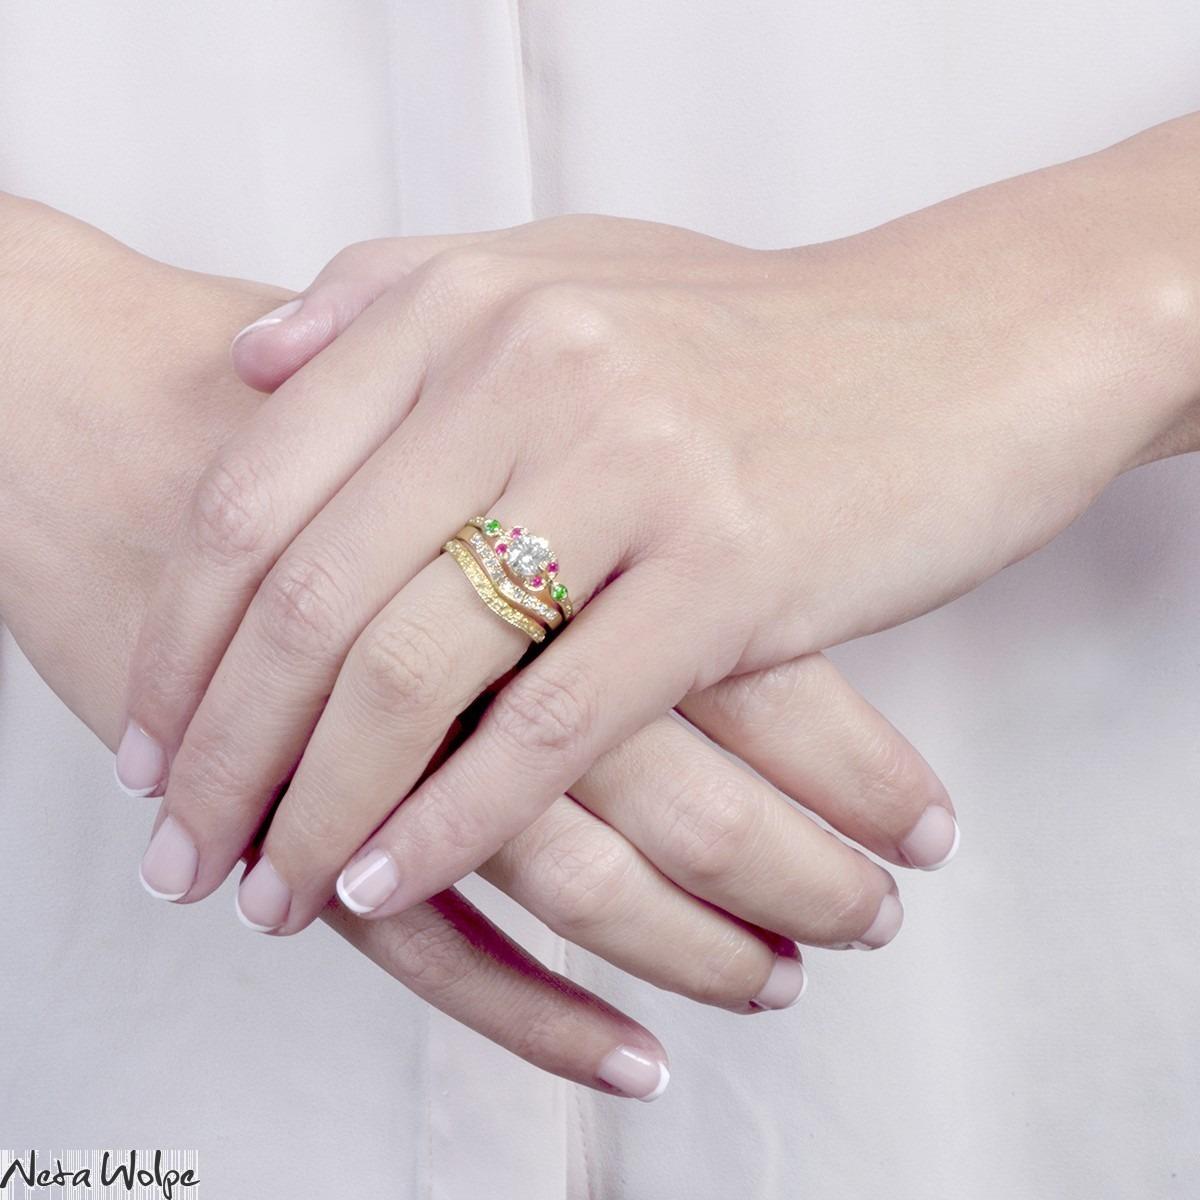 Festive Stackable Rings | Festive Stackable Rings